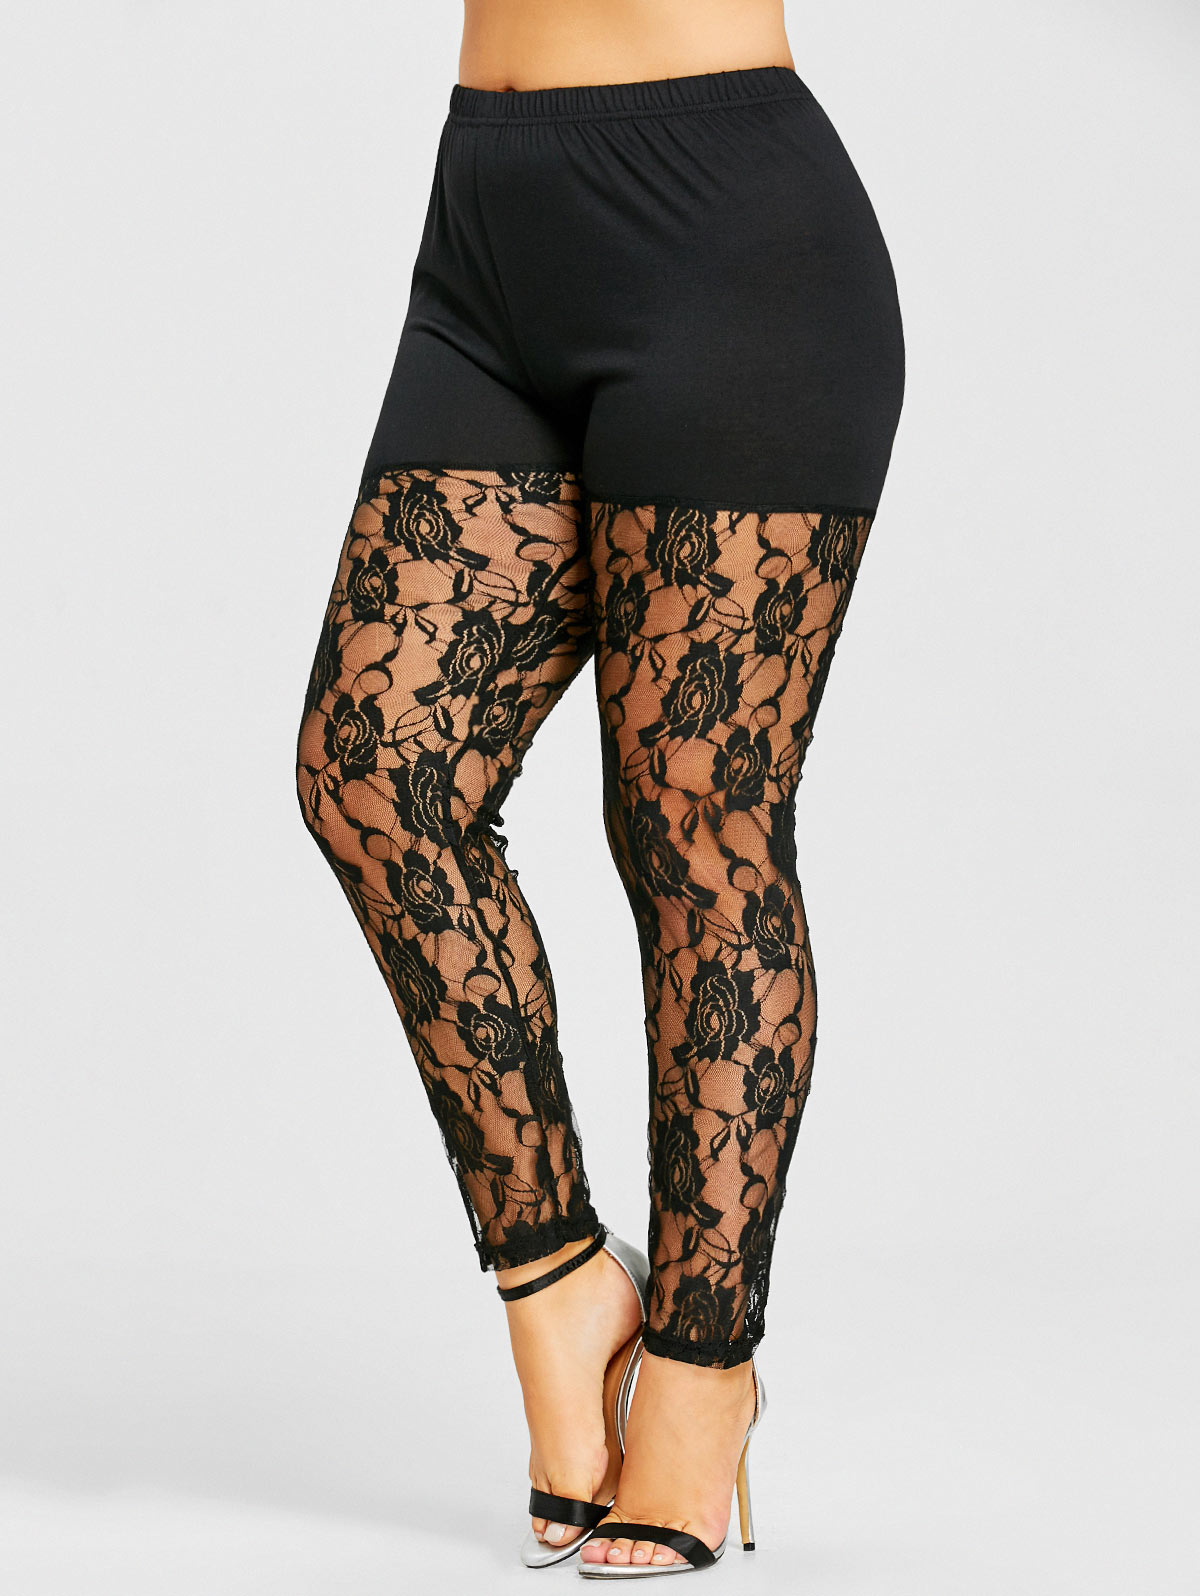 Wipalo Plus Size 5XL High Waist Black Sexy Floral Lace Sheer   Legging   Women Skinny See Through Mesh Pants Capri Big Size 2018